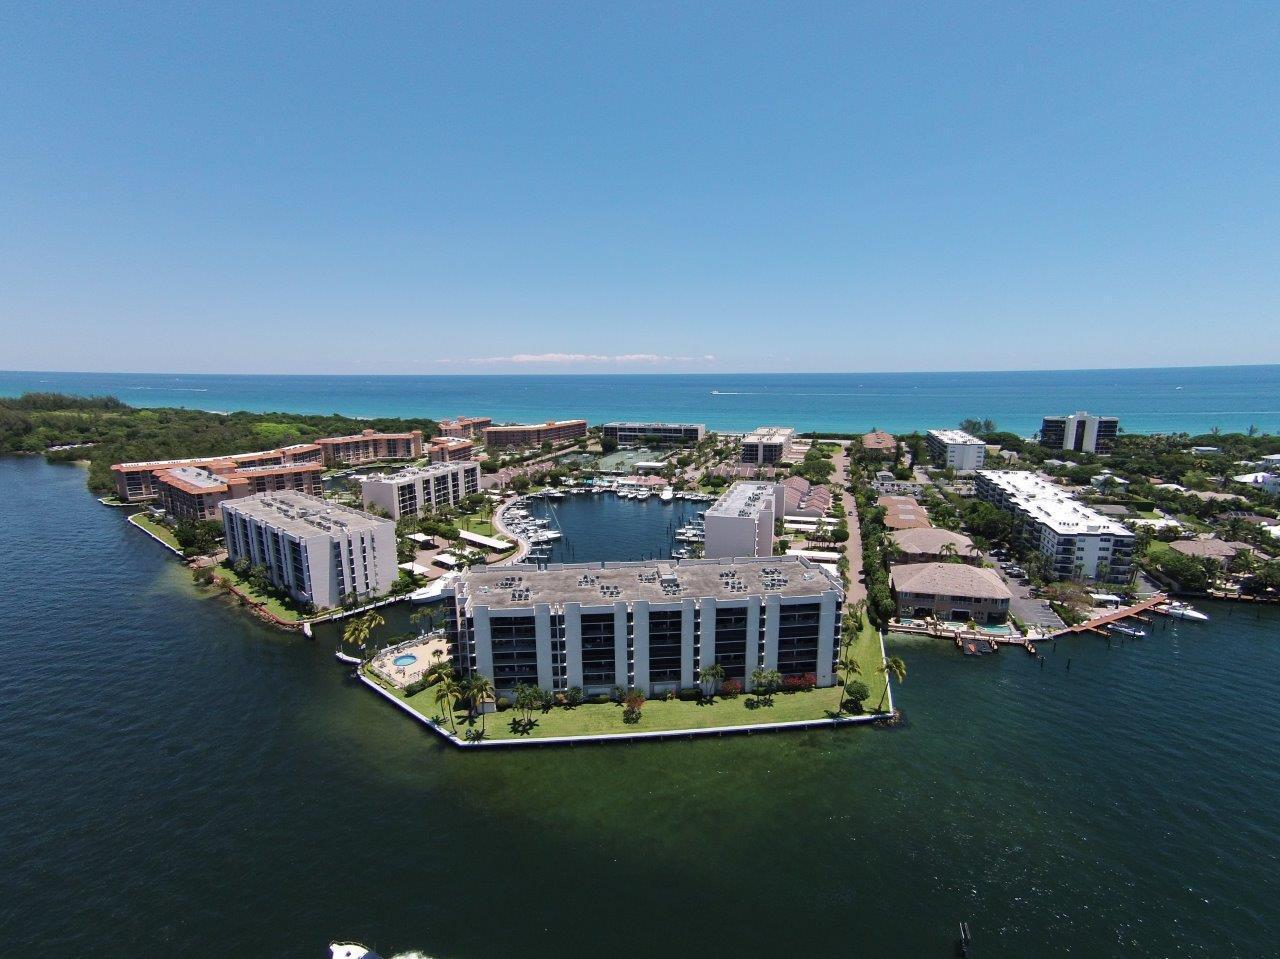 2701 N Ocean Boulevard, E205, Boca Raton, FL 33431